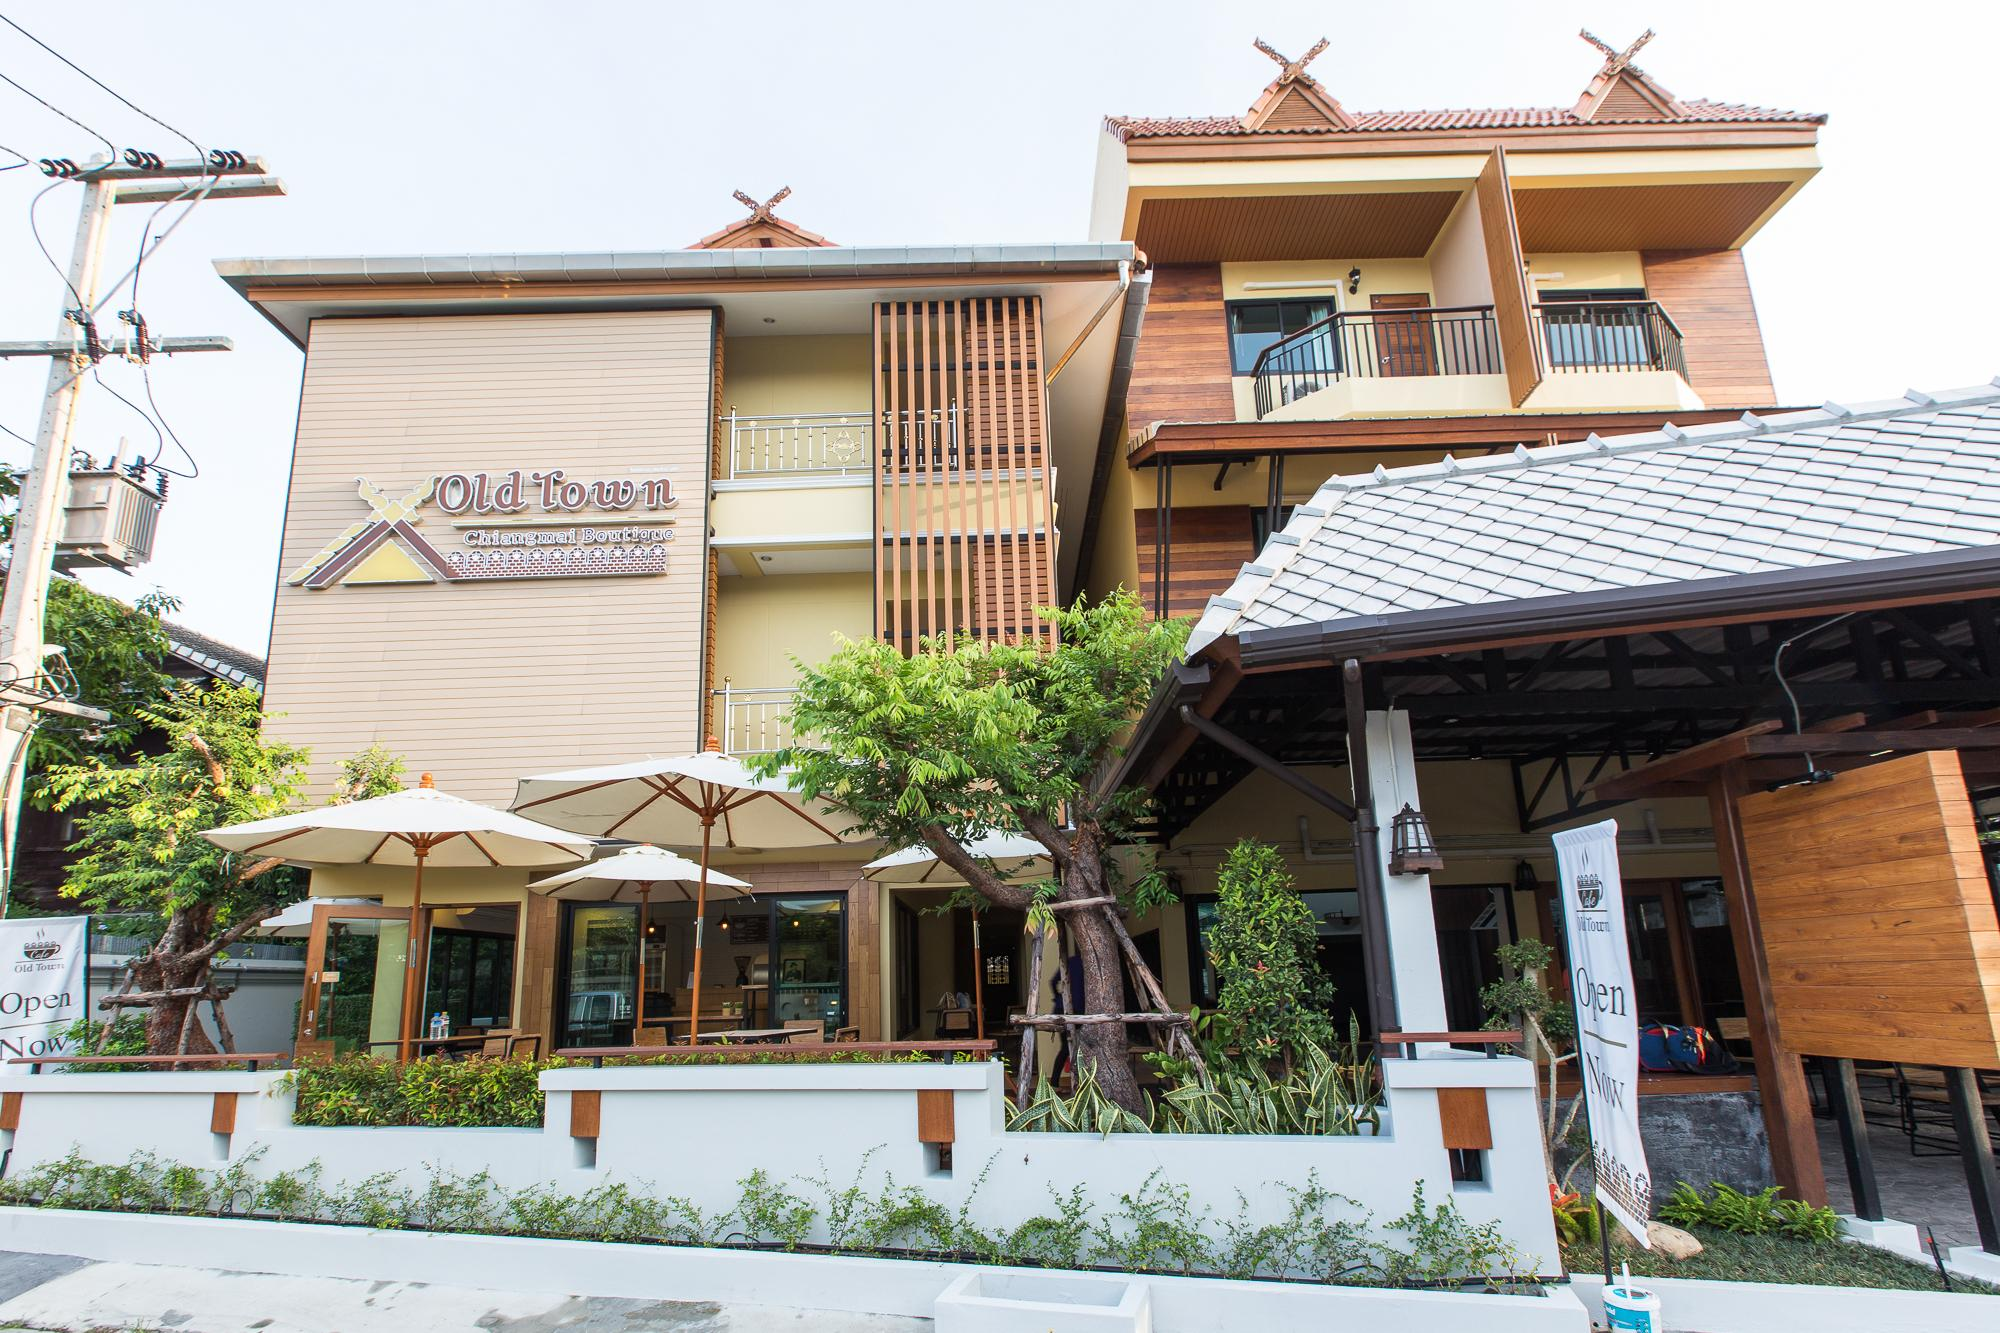 Old Town Chiangmai Boutique,โอลด์ ทาวน์ เชียงใหม่ บูทิก